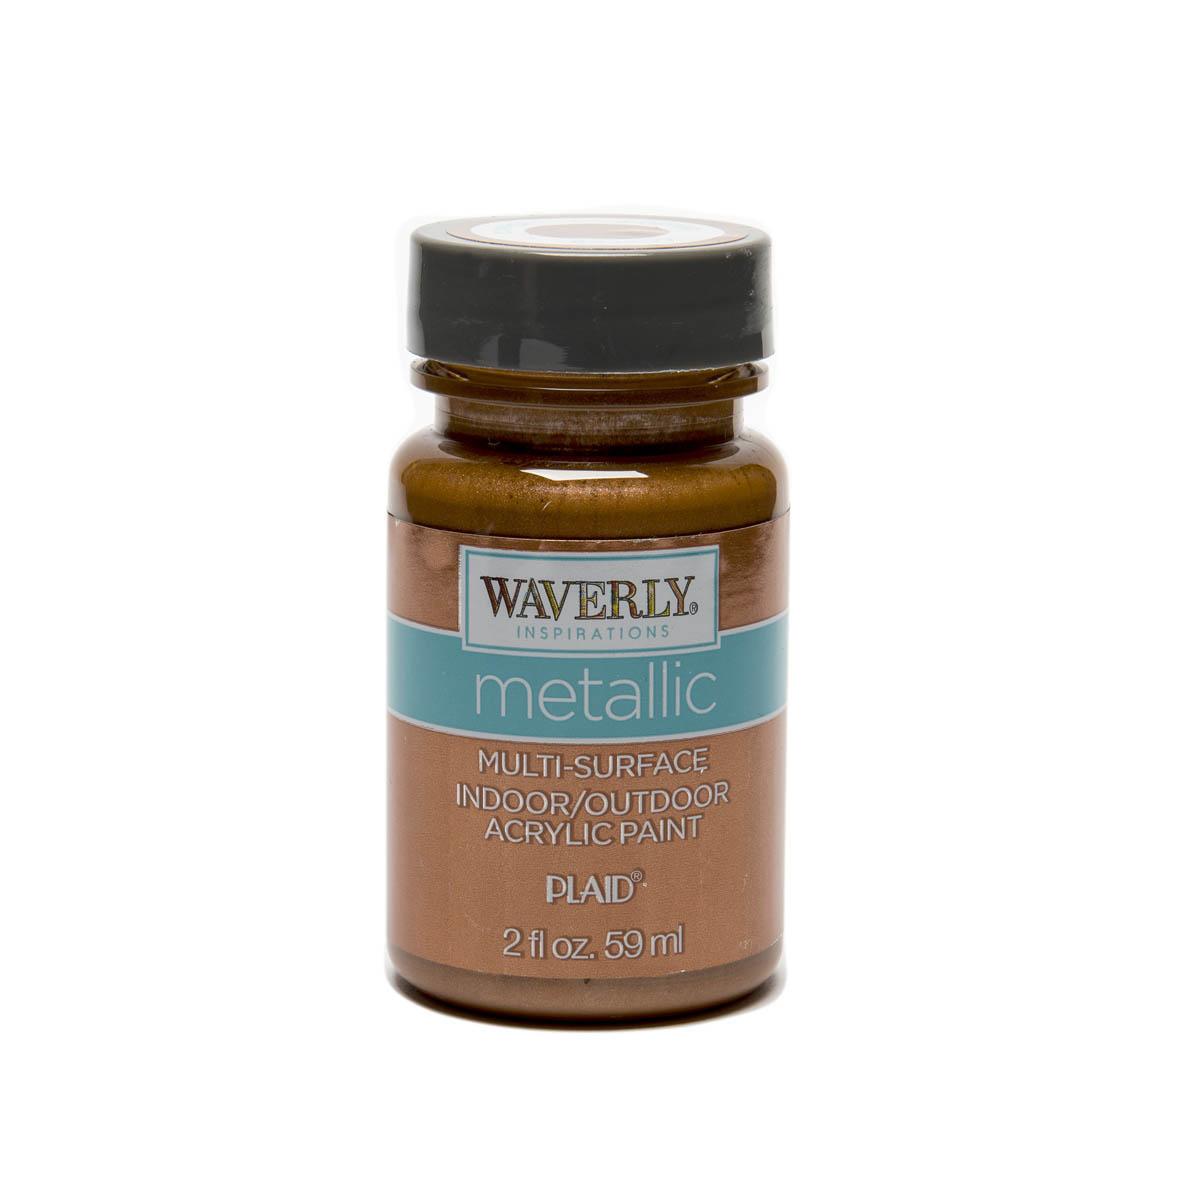 Waverly ® Inspirations Metallic Multi-Surface Acrylic Paint - Copper, 2 oz.